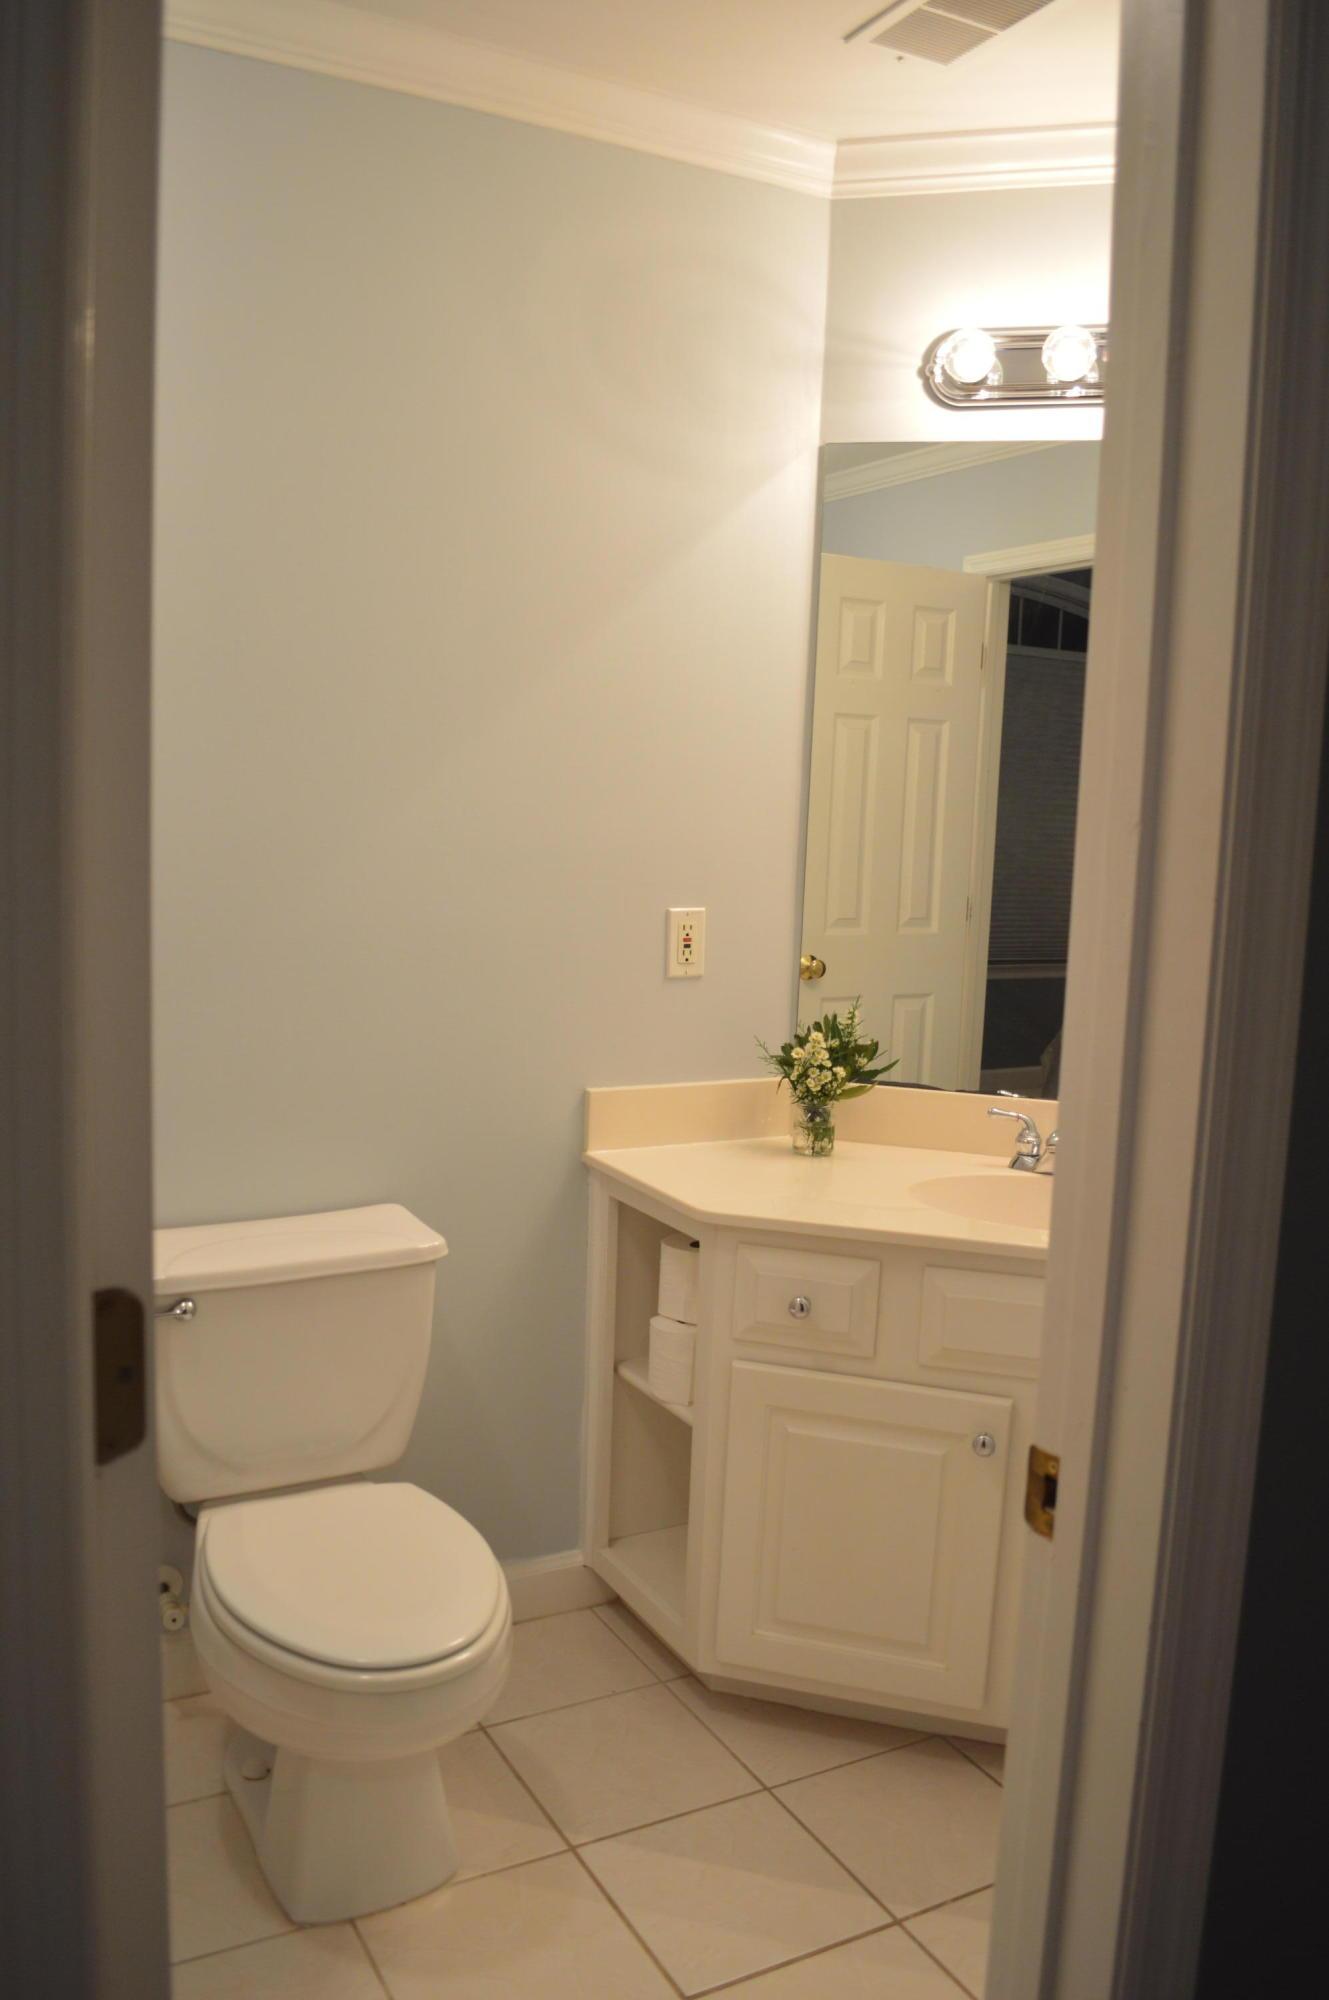 Dunes West Homes For Sale - 1345 White Deer, Mount Pleasant, SC - 8